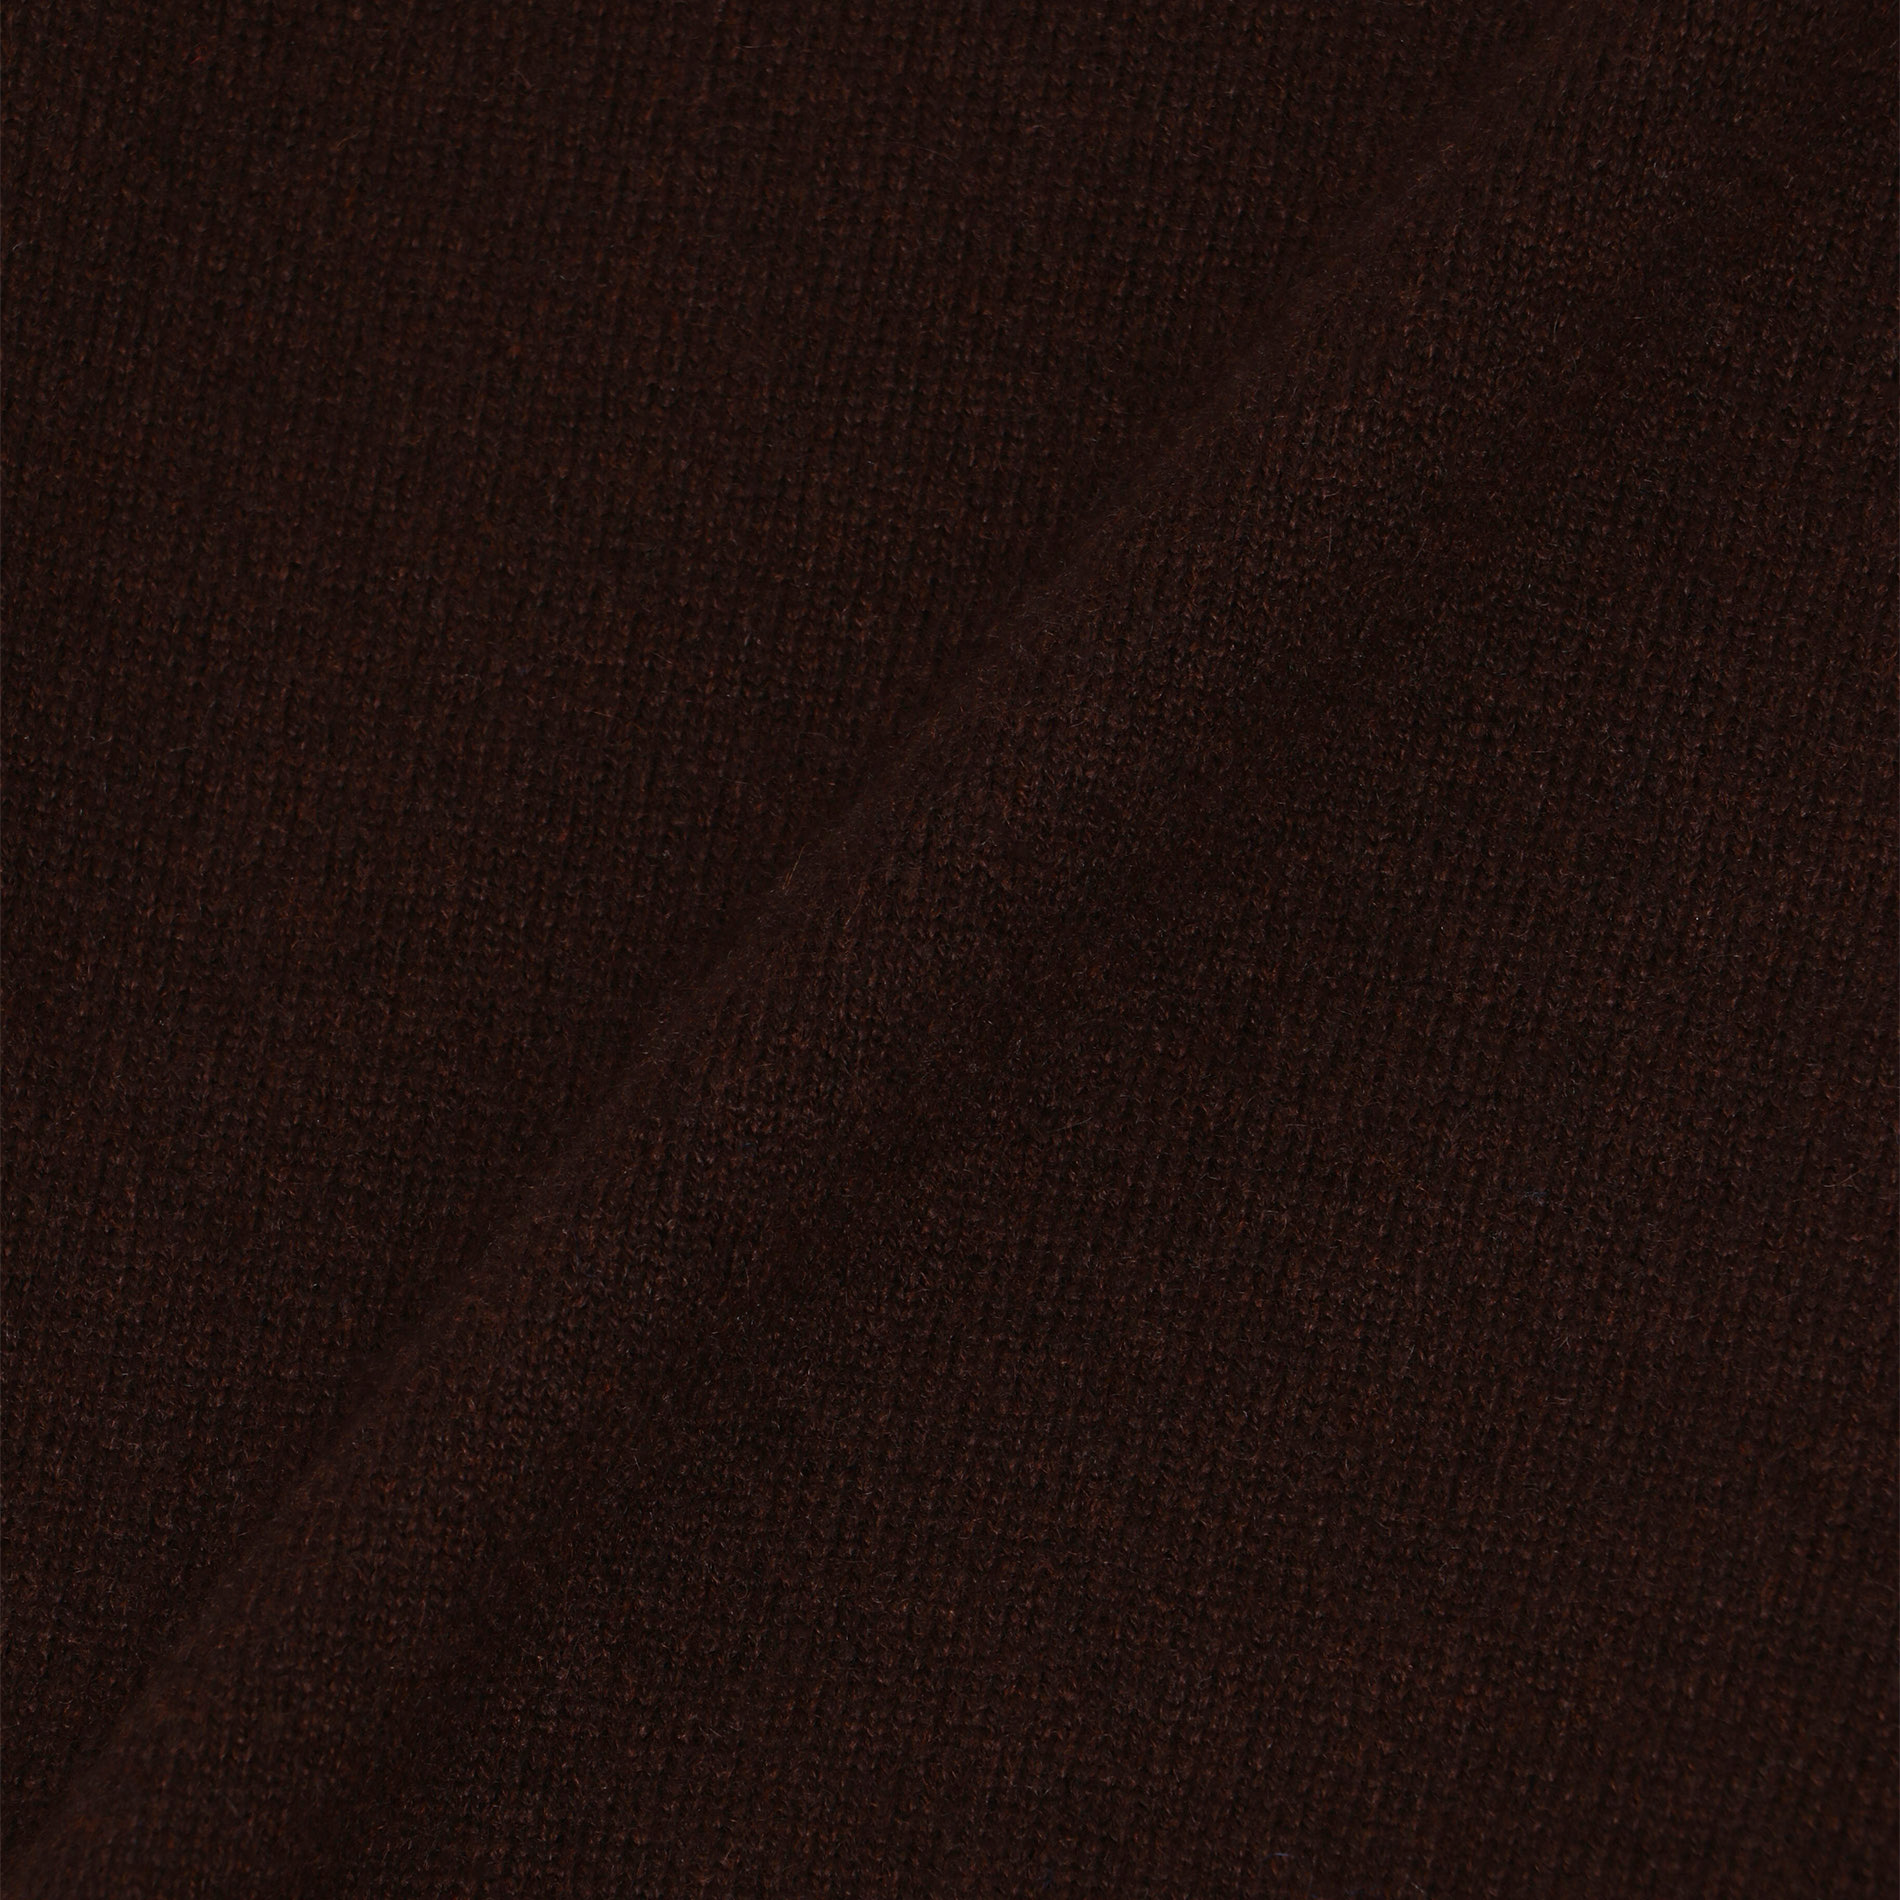 【The Essential Collection】カシミヤニットクルーネックカーディガン